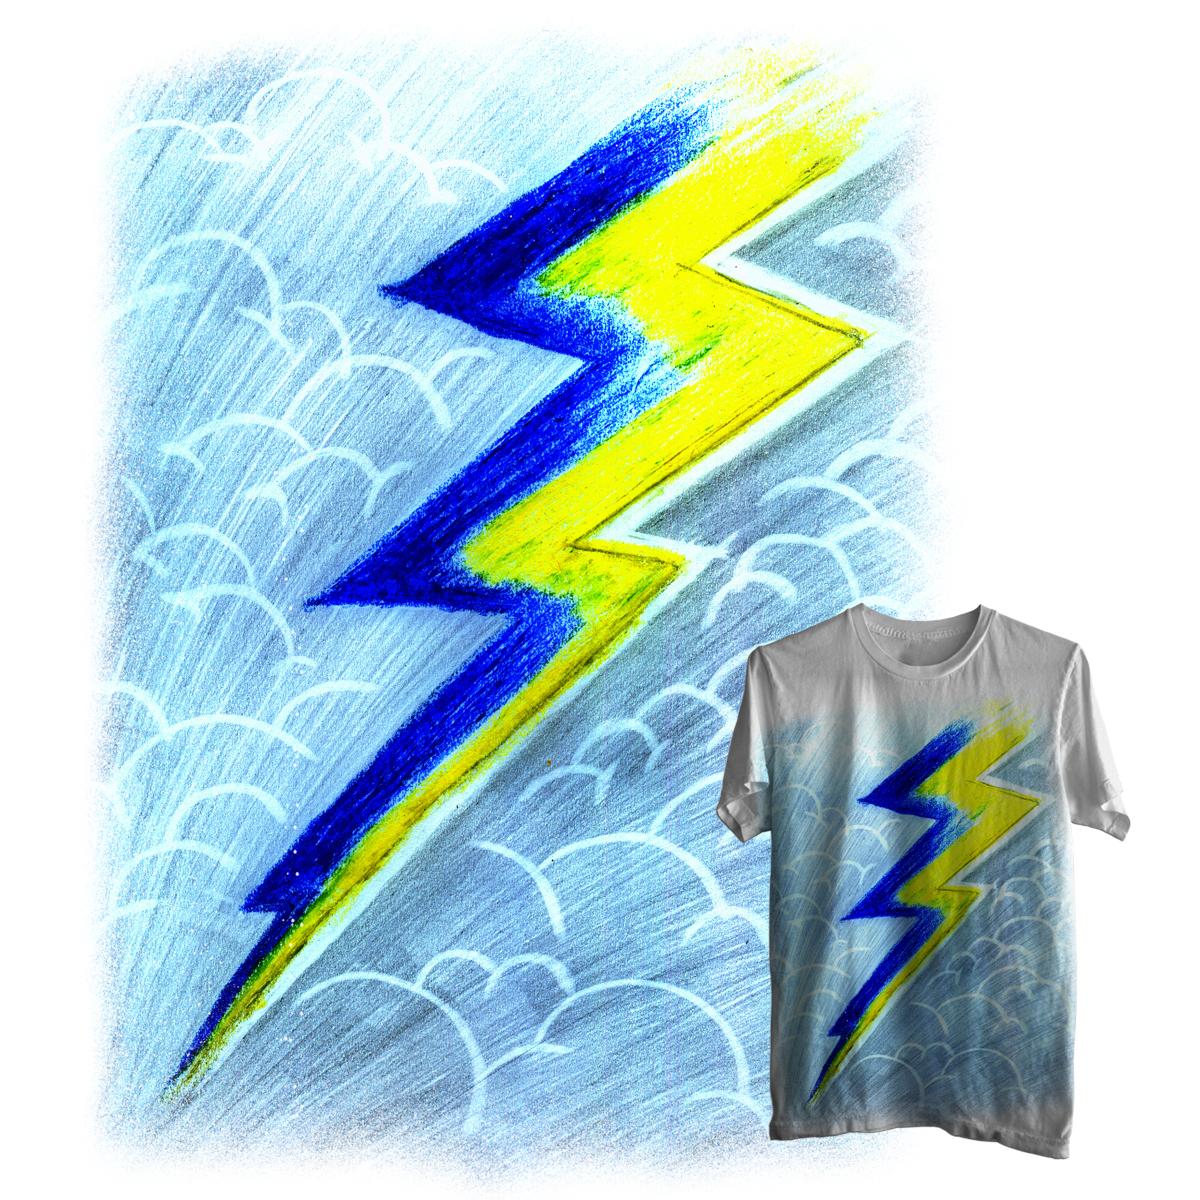 Thunder by ndough on Threadless